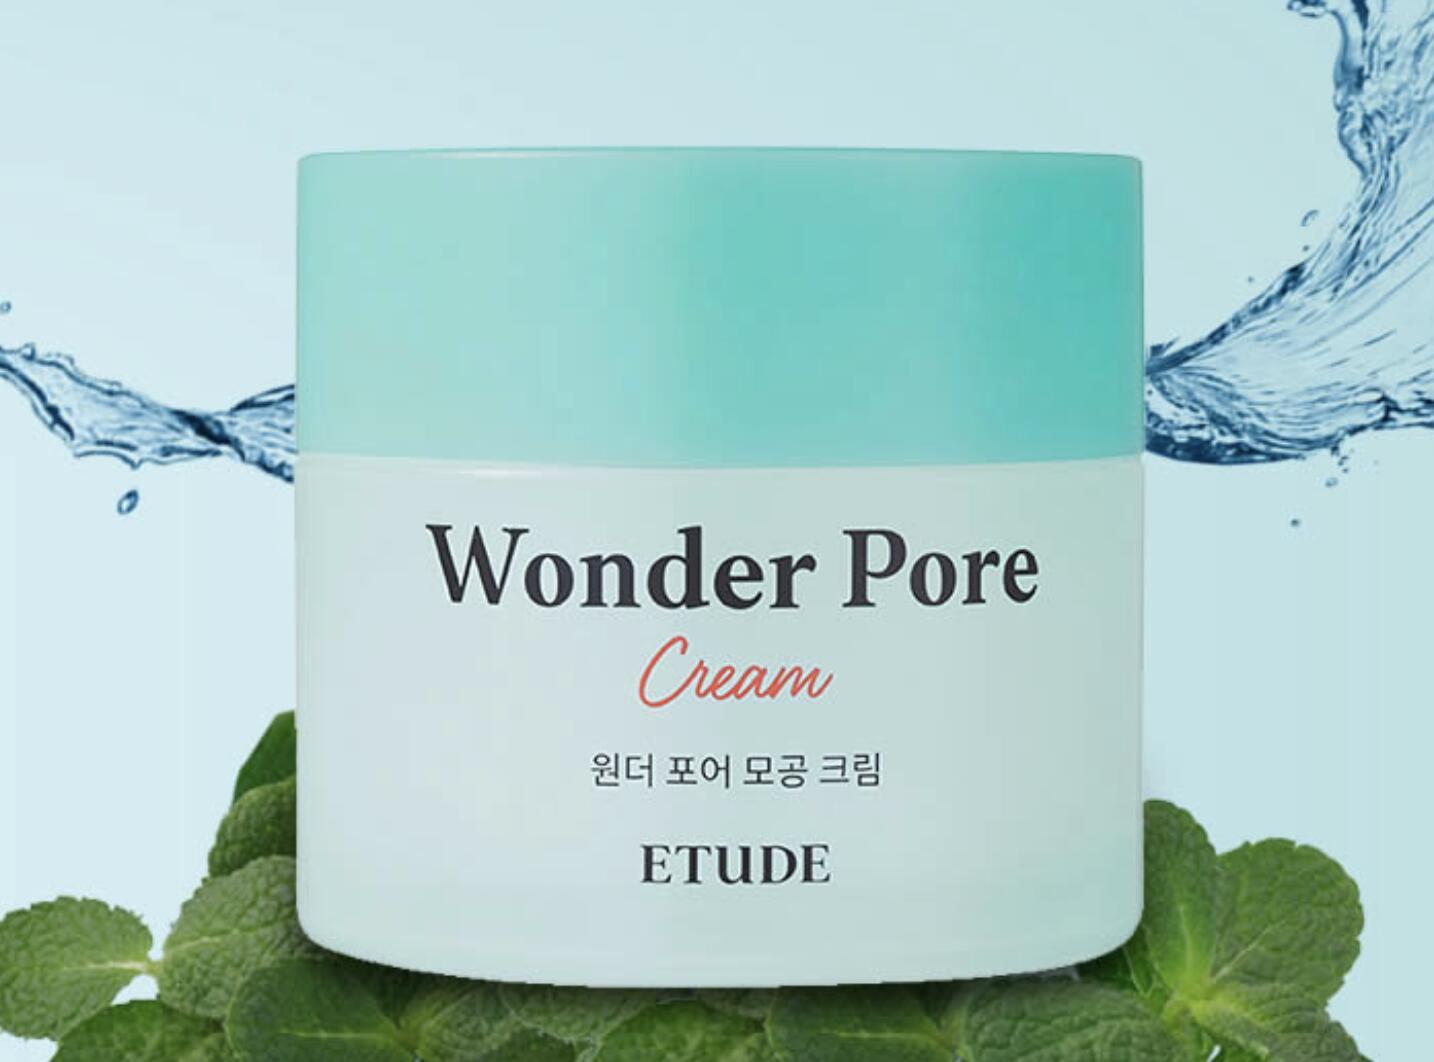 ETUDE HOUSE 発売モデル 送料無料 エチュードハウス ワンダーポアクリーム 75ml 毛穴クリーム ポアクリーム 韓国コスメ トナー プチプラ 正規品 つや肌 保湿 即出荷 美肌 化粧水